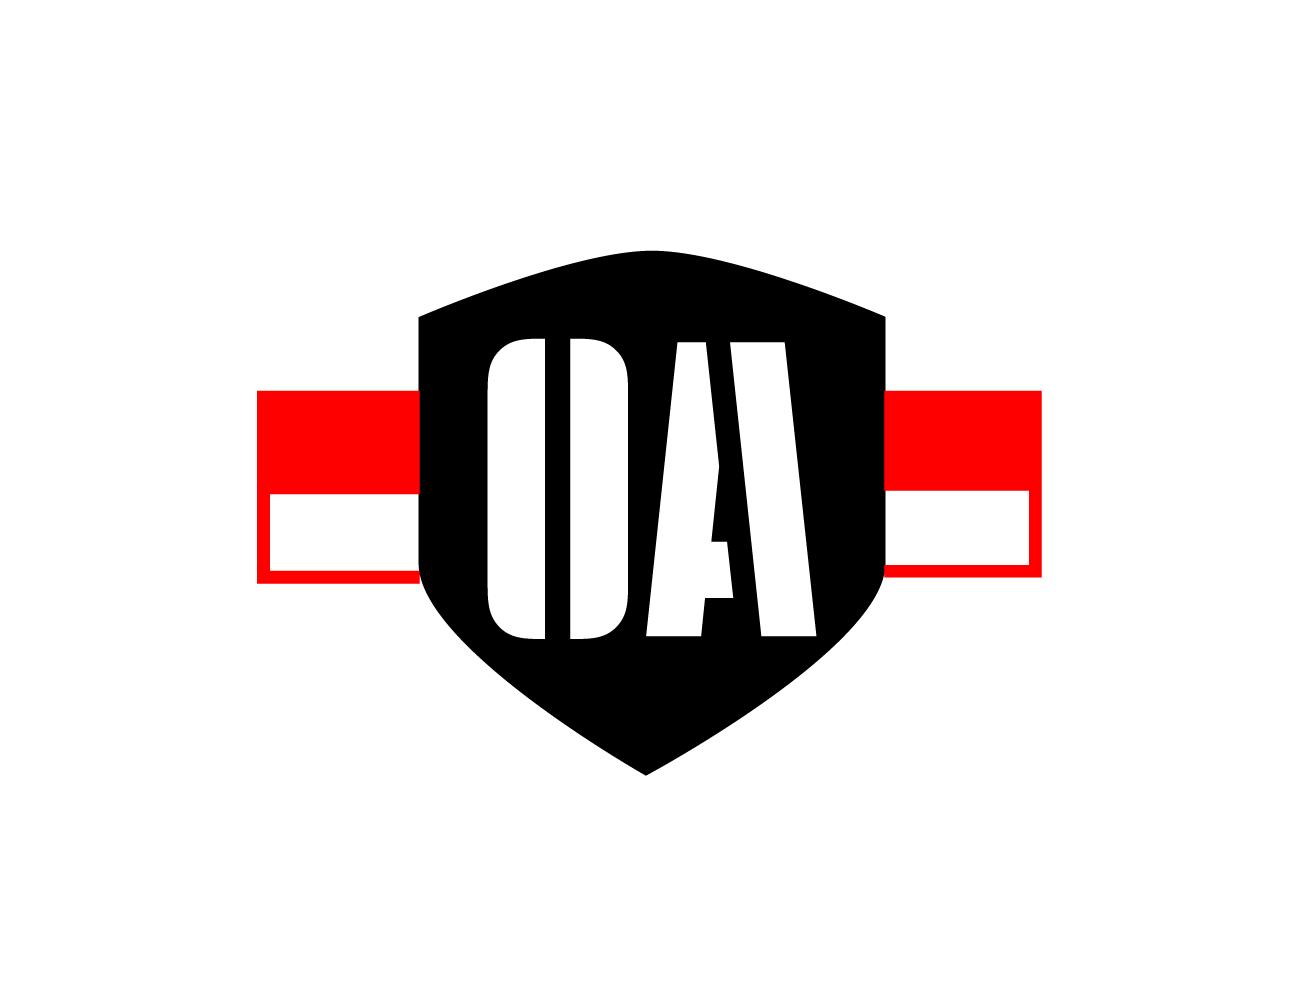 Fire-OA-intermediate.png